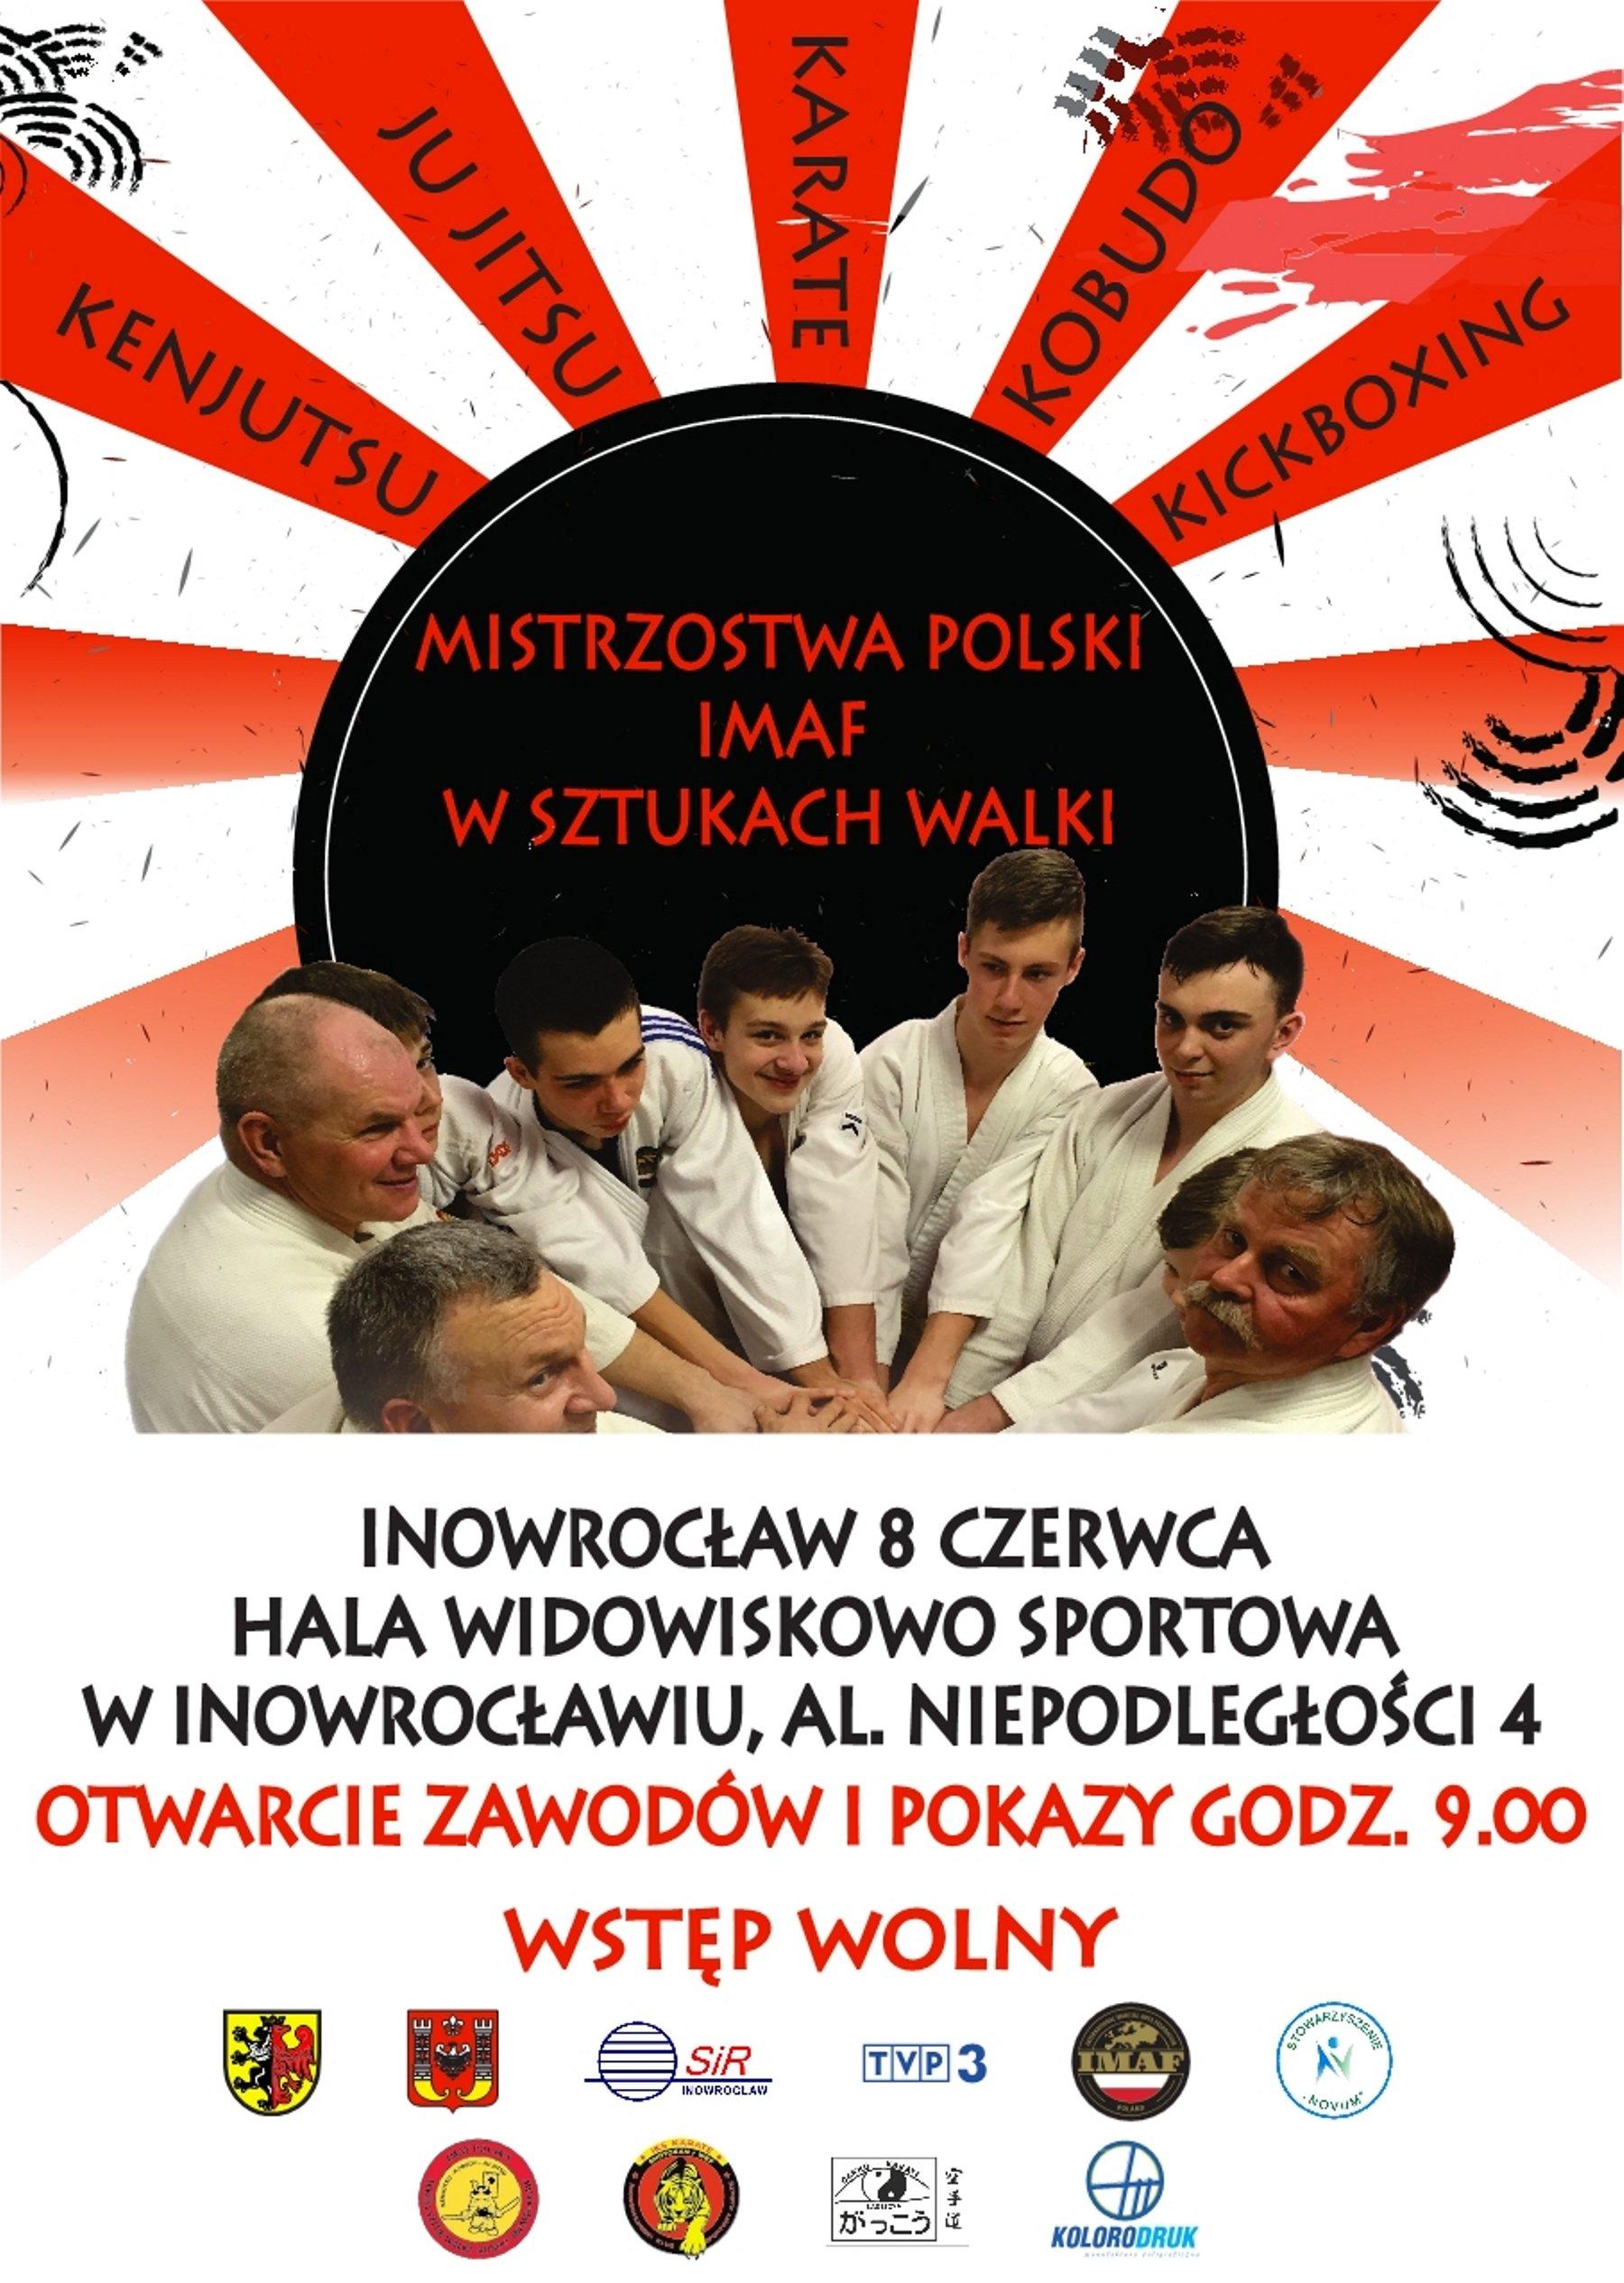 International Martial Arts Federation Oddział Polska Imaf